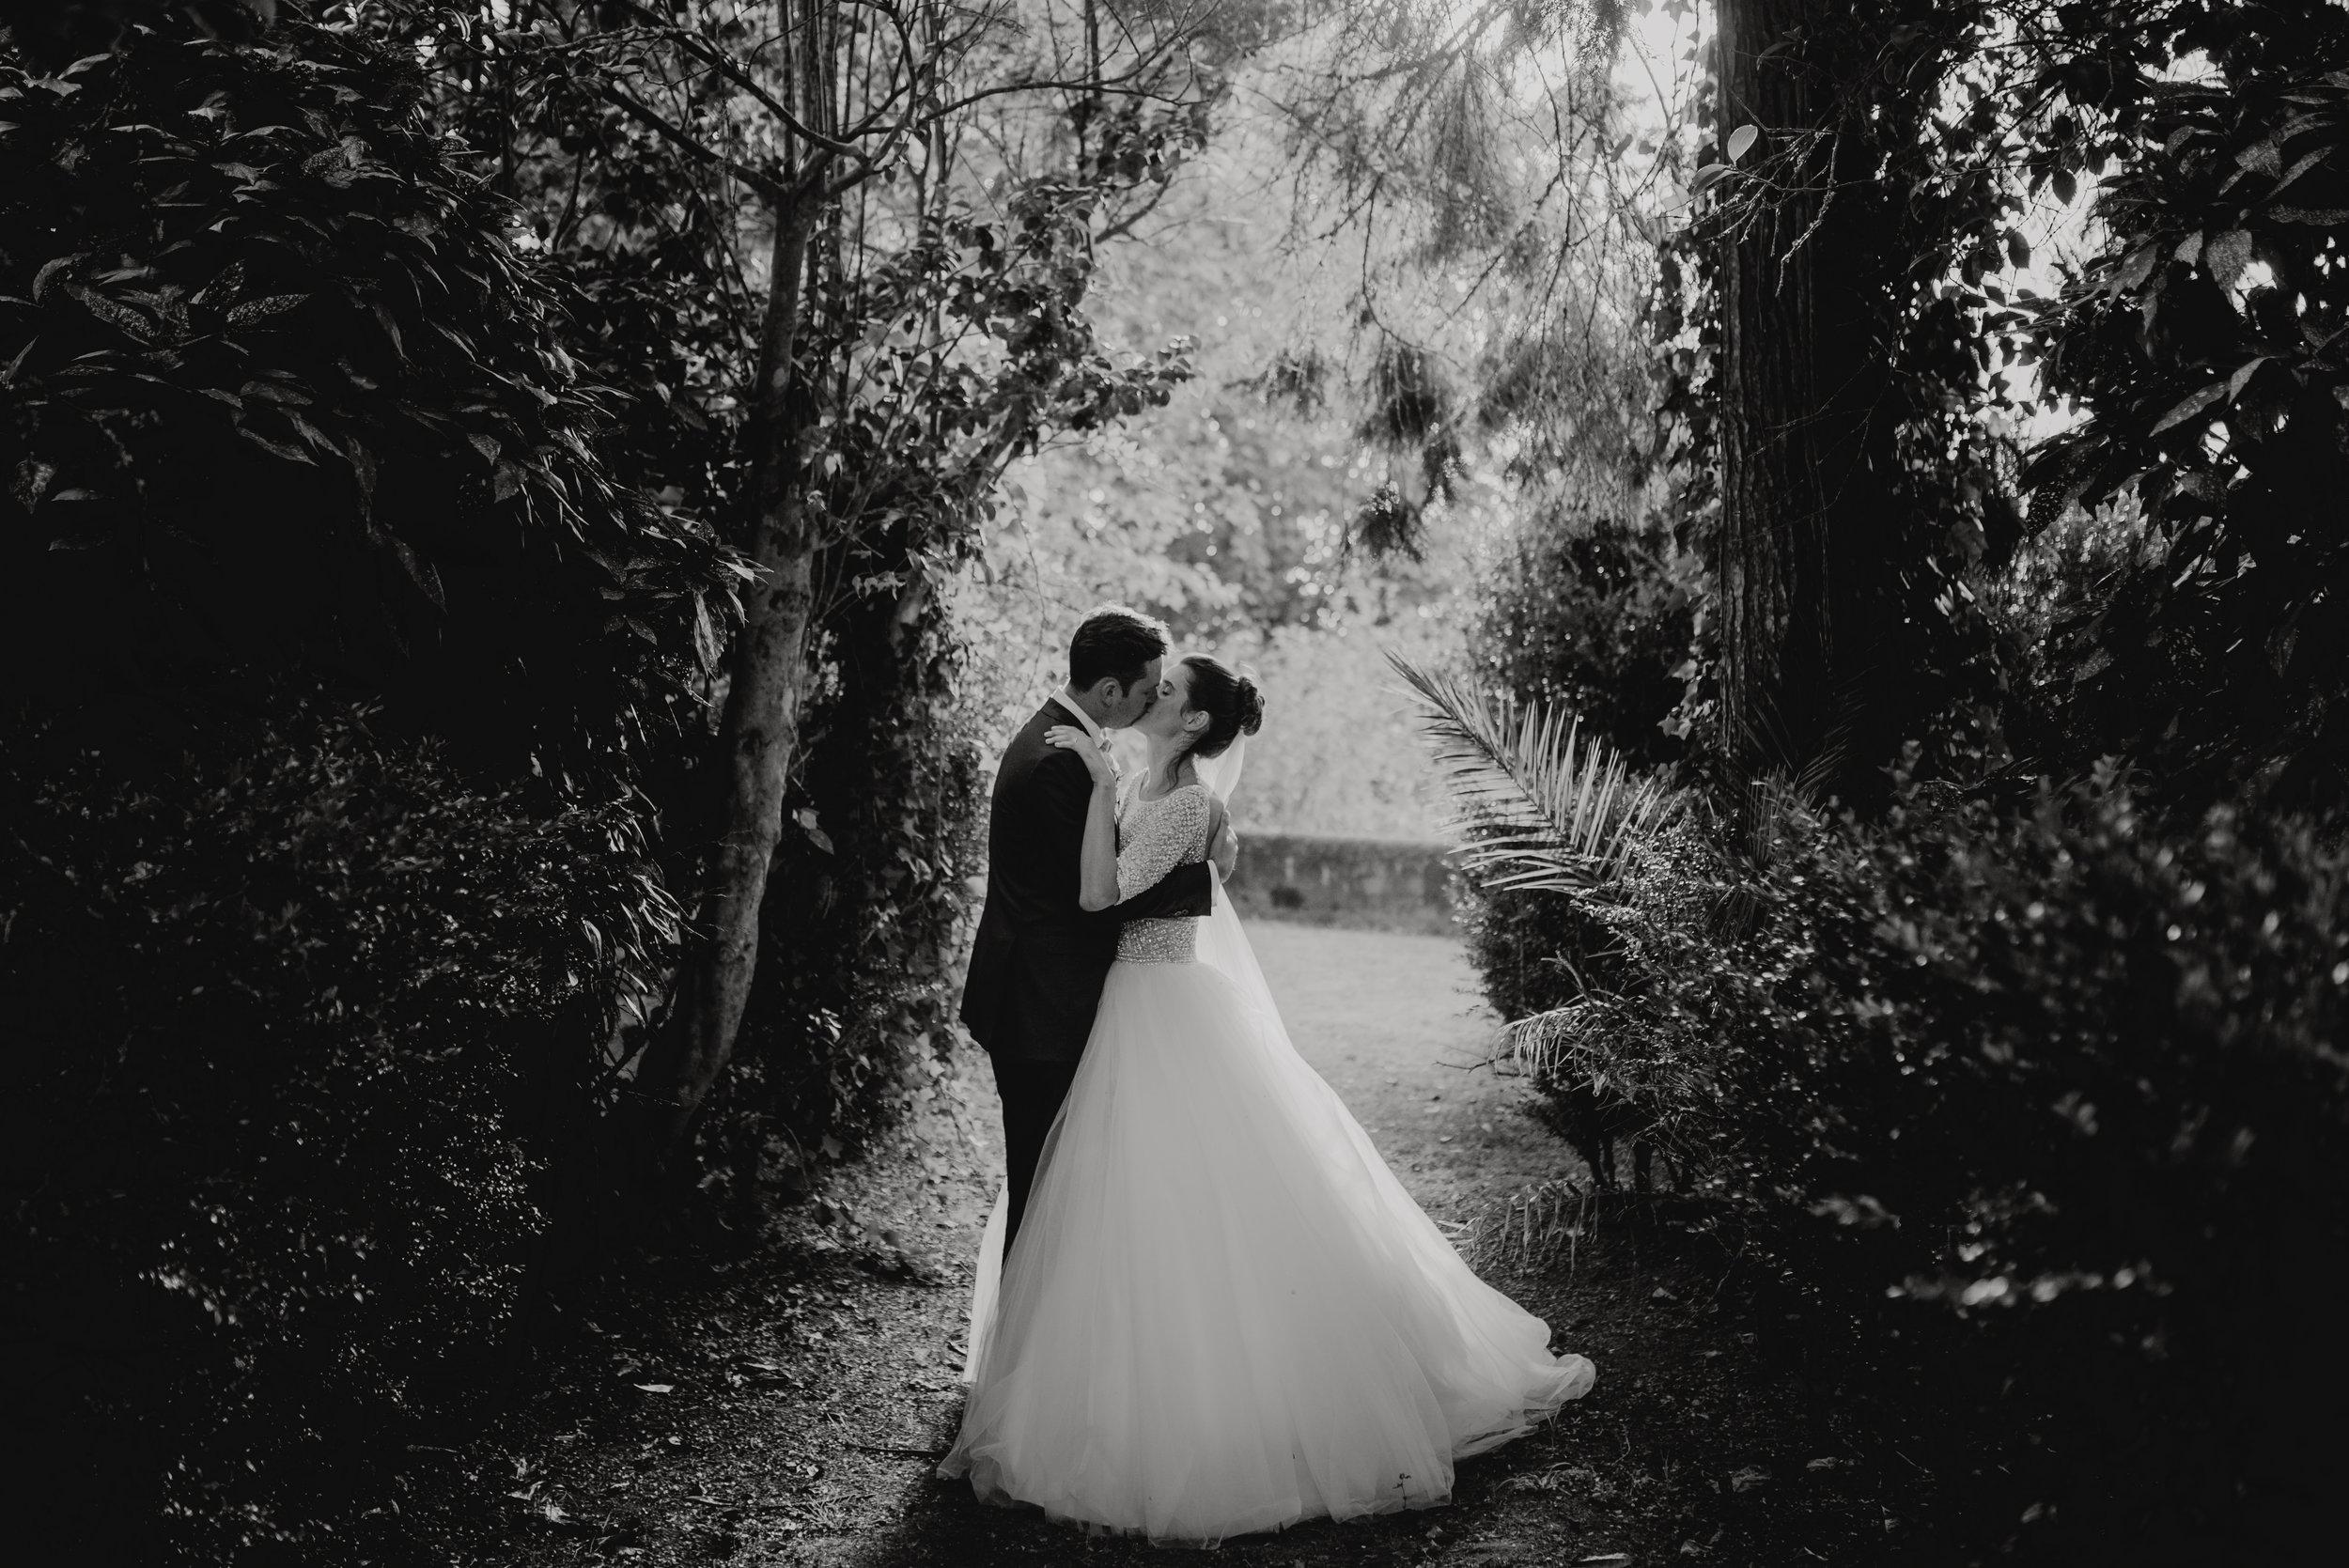 Lapela-photography-wedding-sintra-portugal-100.jpg